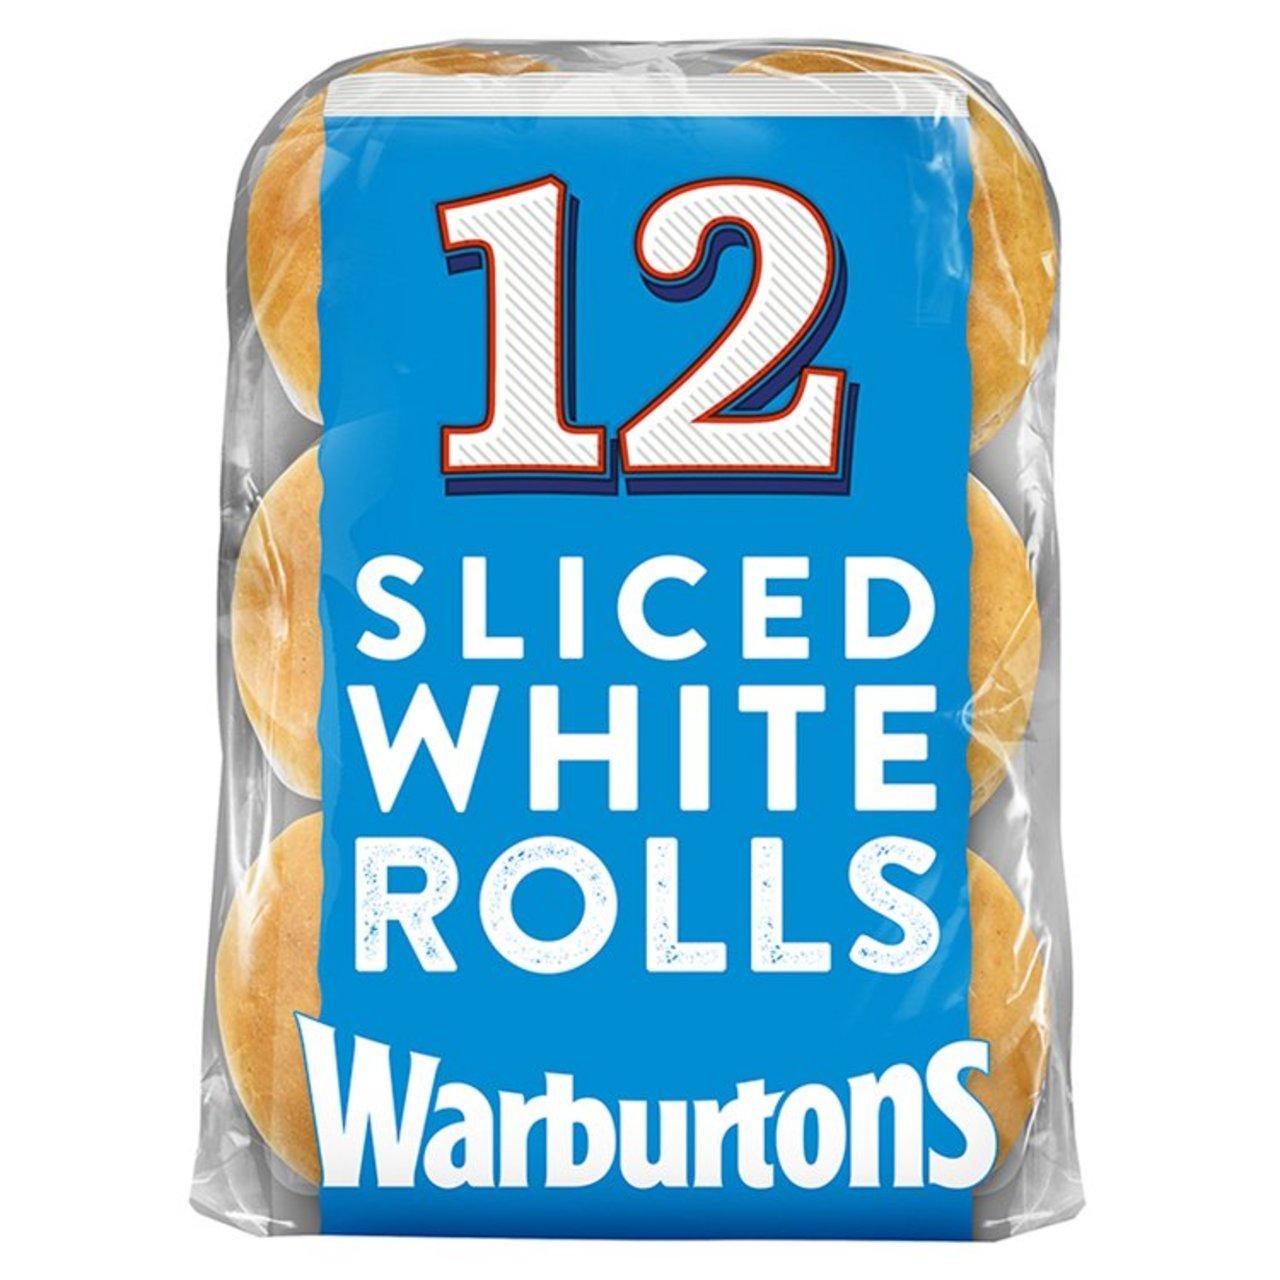 Sliced White Rolls x 12